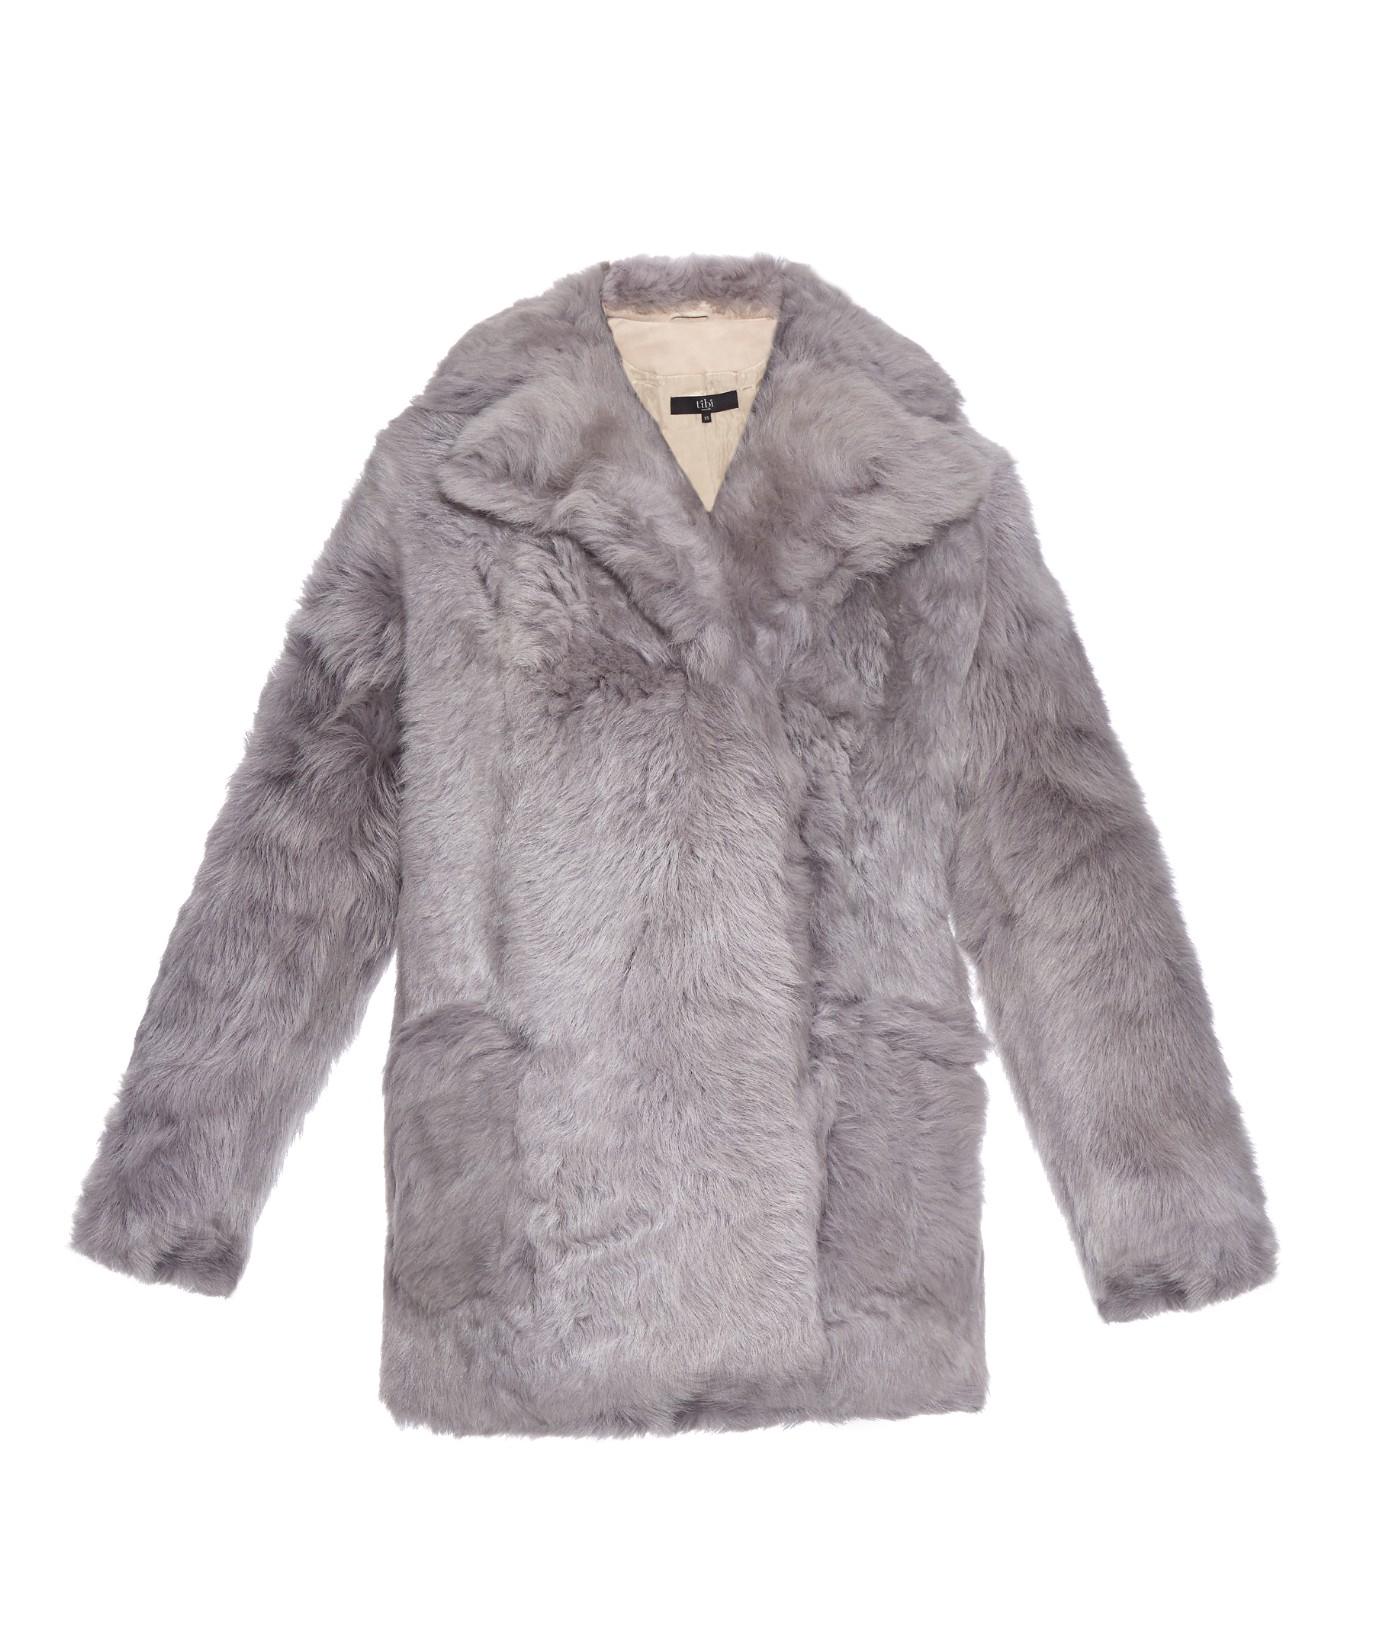 Tibi Toscana Shearling Coat in Gray | Lyst